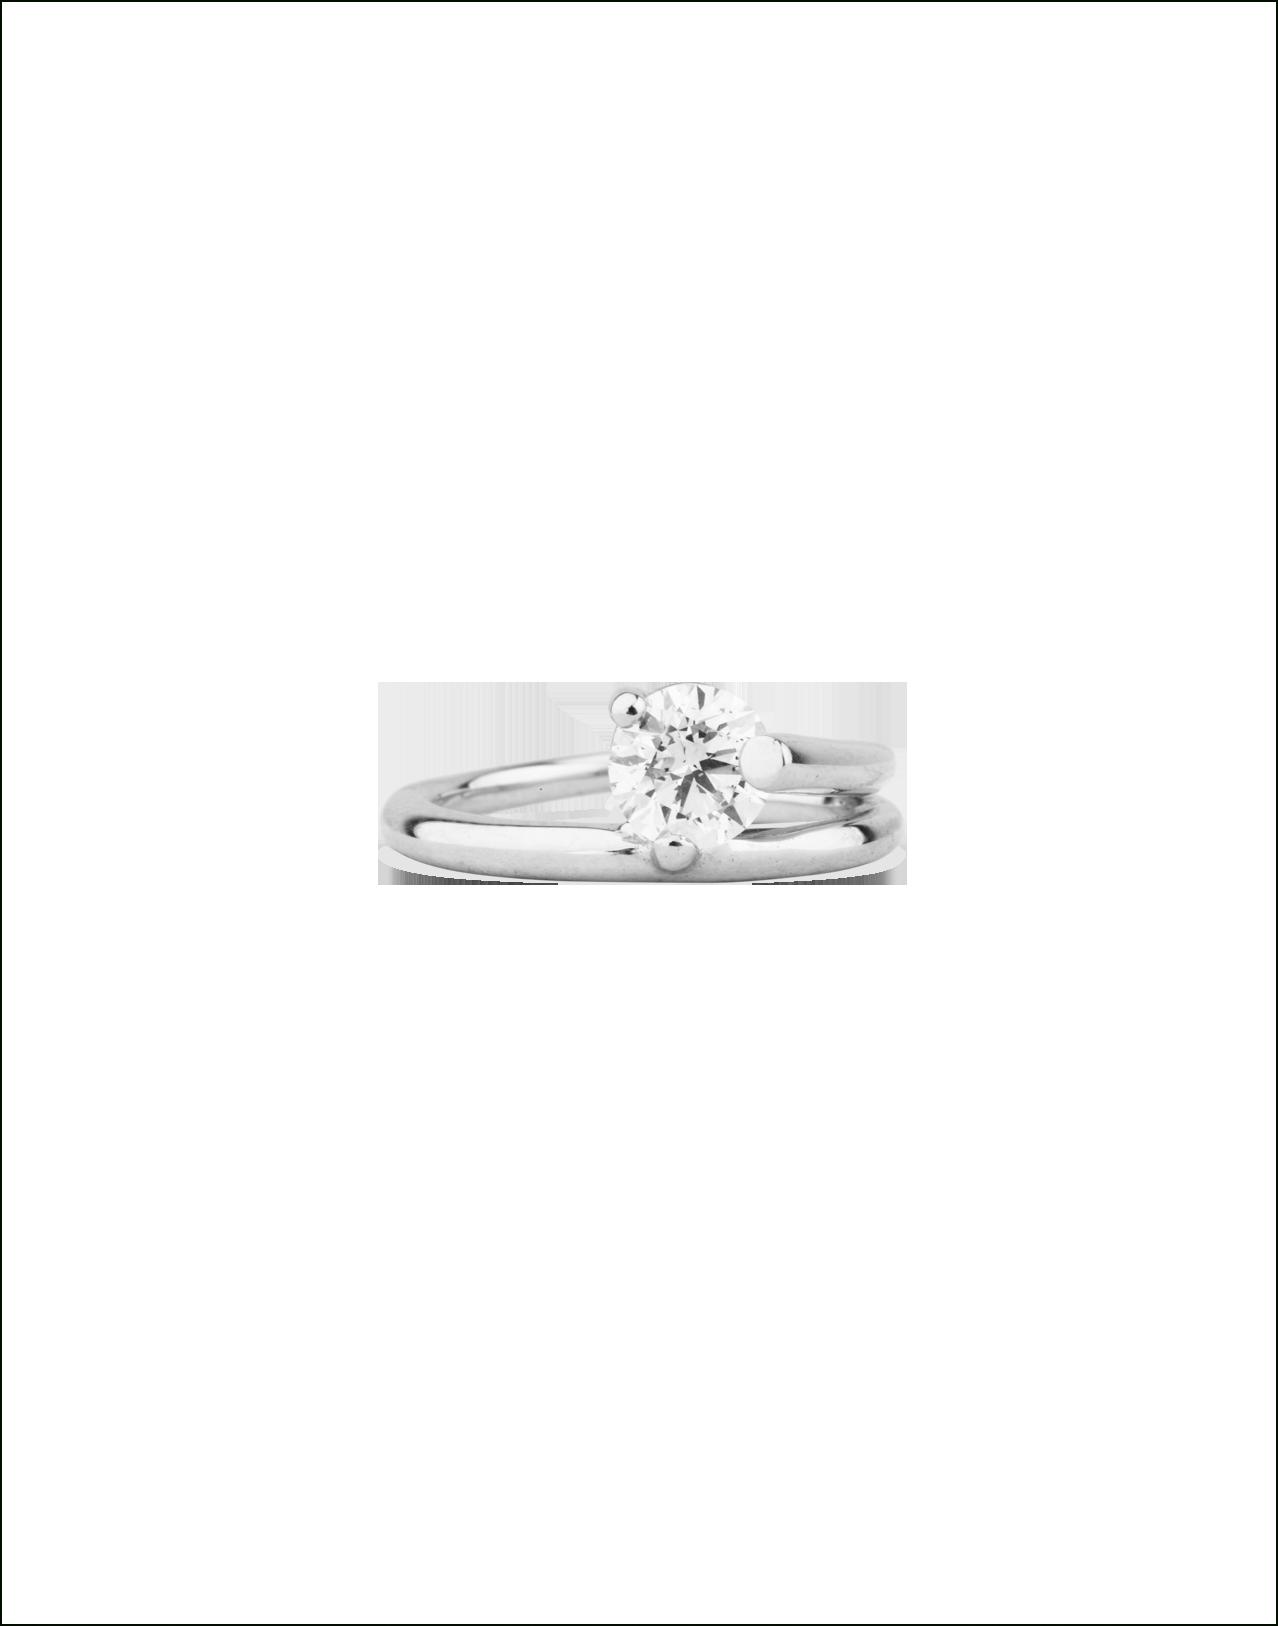 Completedworks-Subverted-Flower-Bridal-Ring-WHITE-GOLD-2-1.png